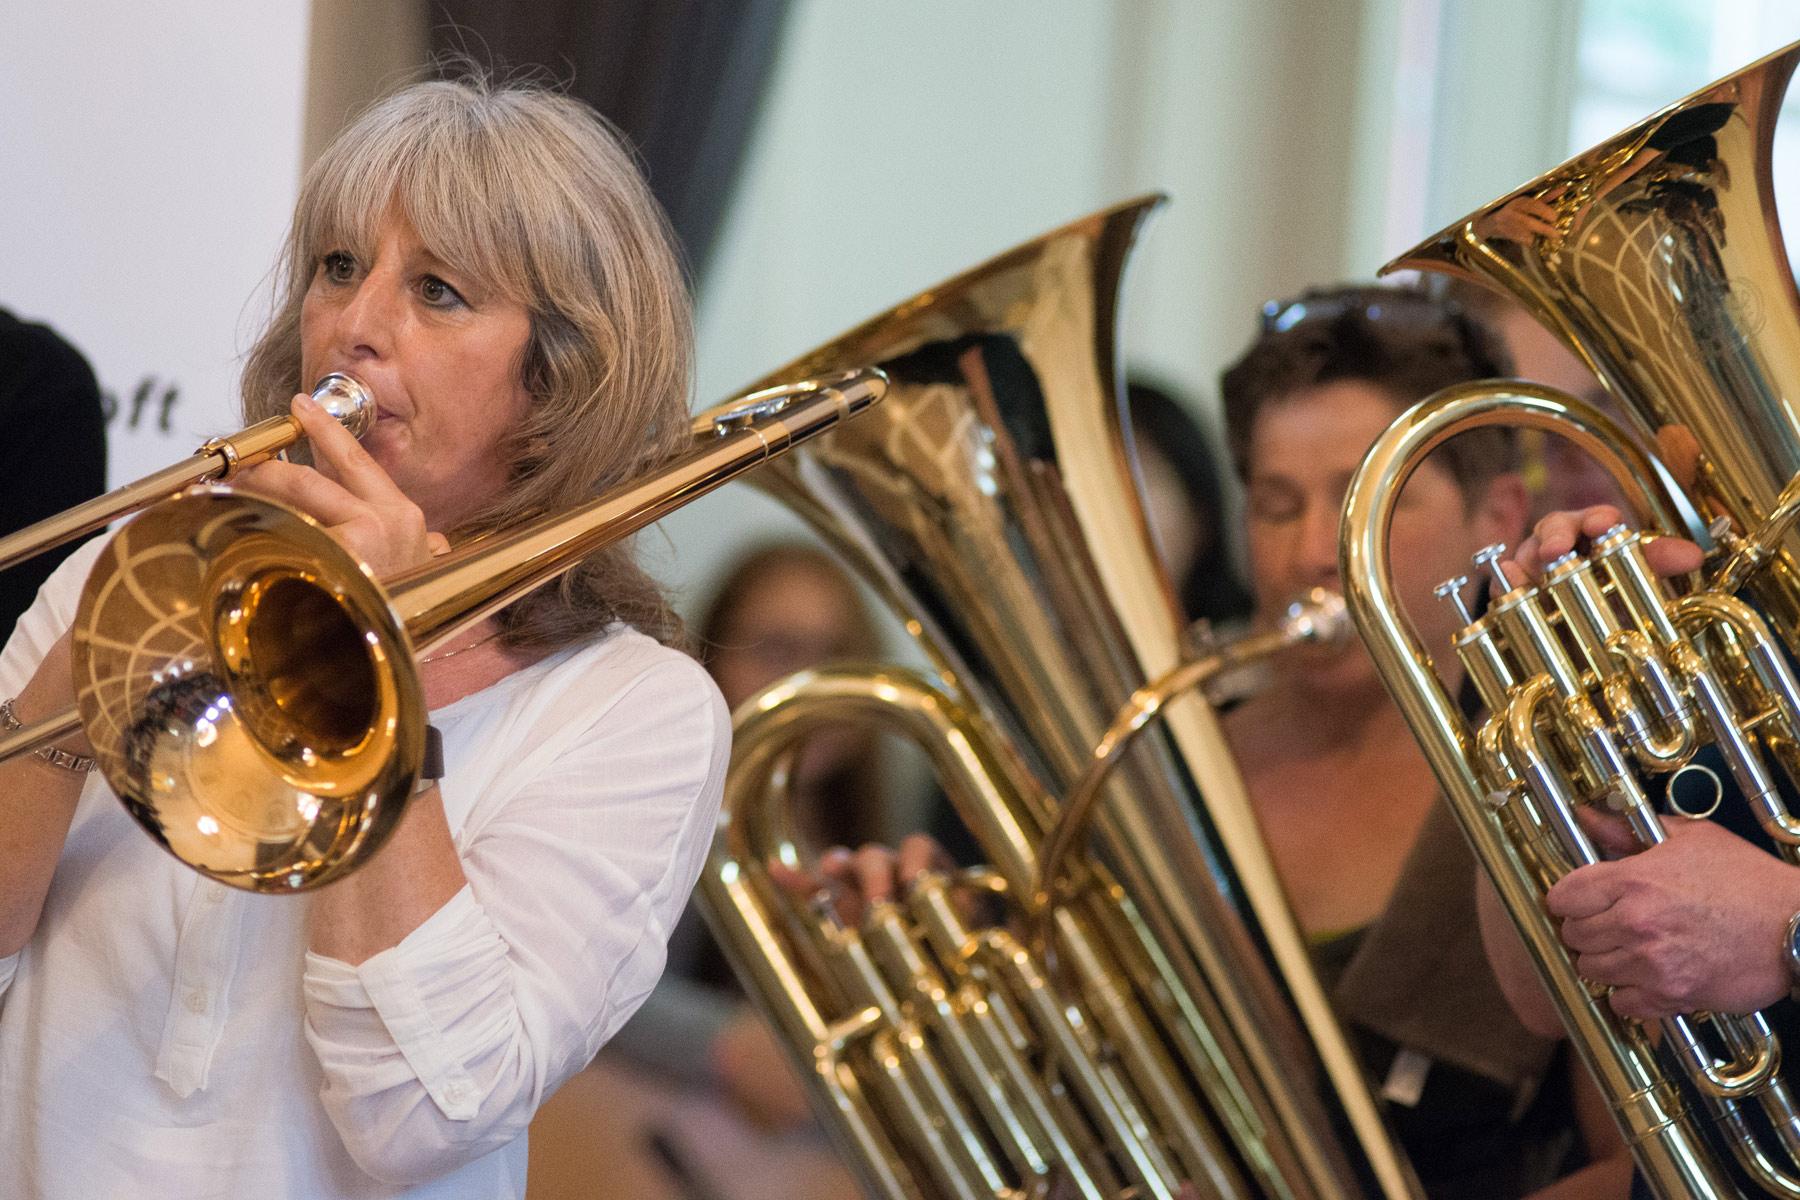 Anti-Aging Bläserensemble - Posaune und Tuba - music loft | Freie Musikschule Aachen